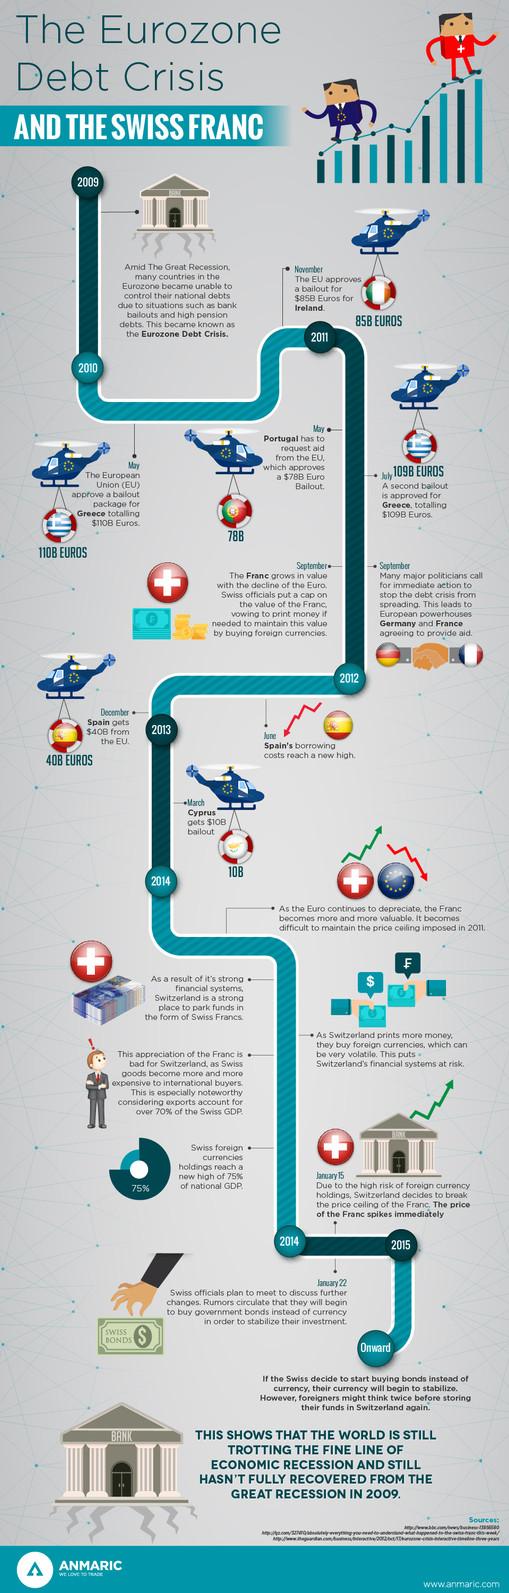 The Eurozone Debt Crises And The Swiss Franc